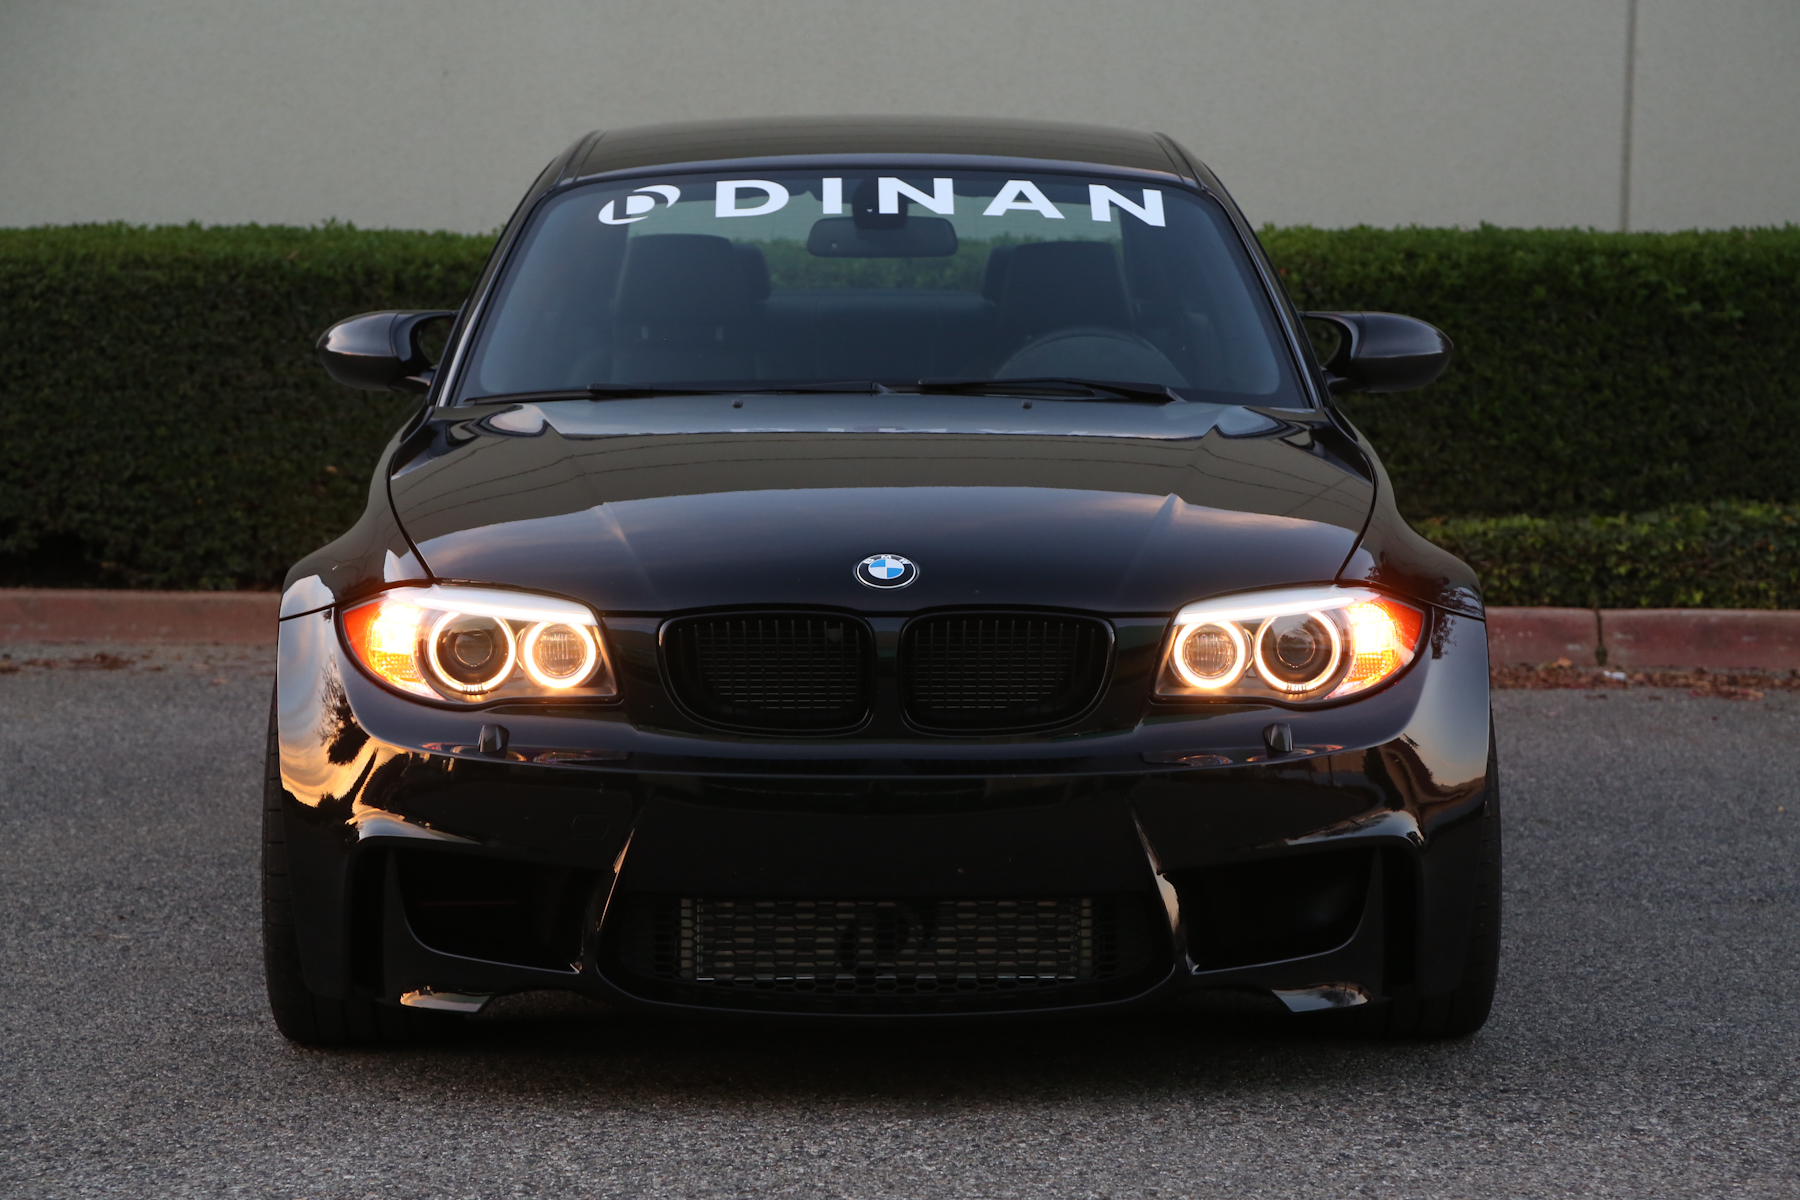 Dinan 1M S3 R BMW 1M Shawn Molnar BMWBLOG 61